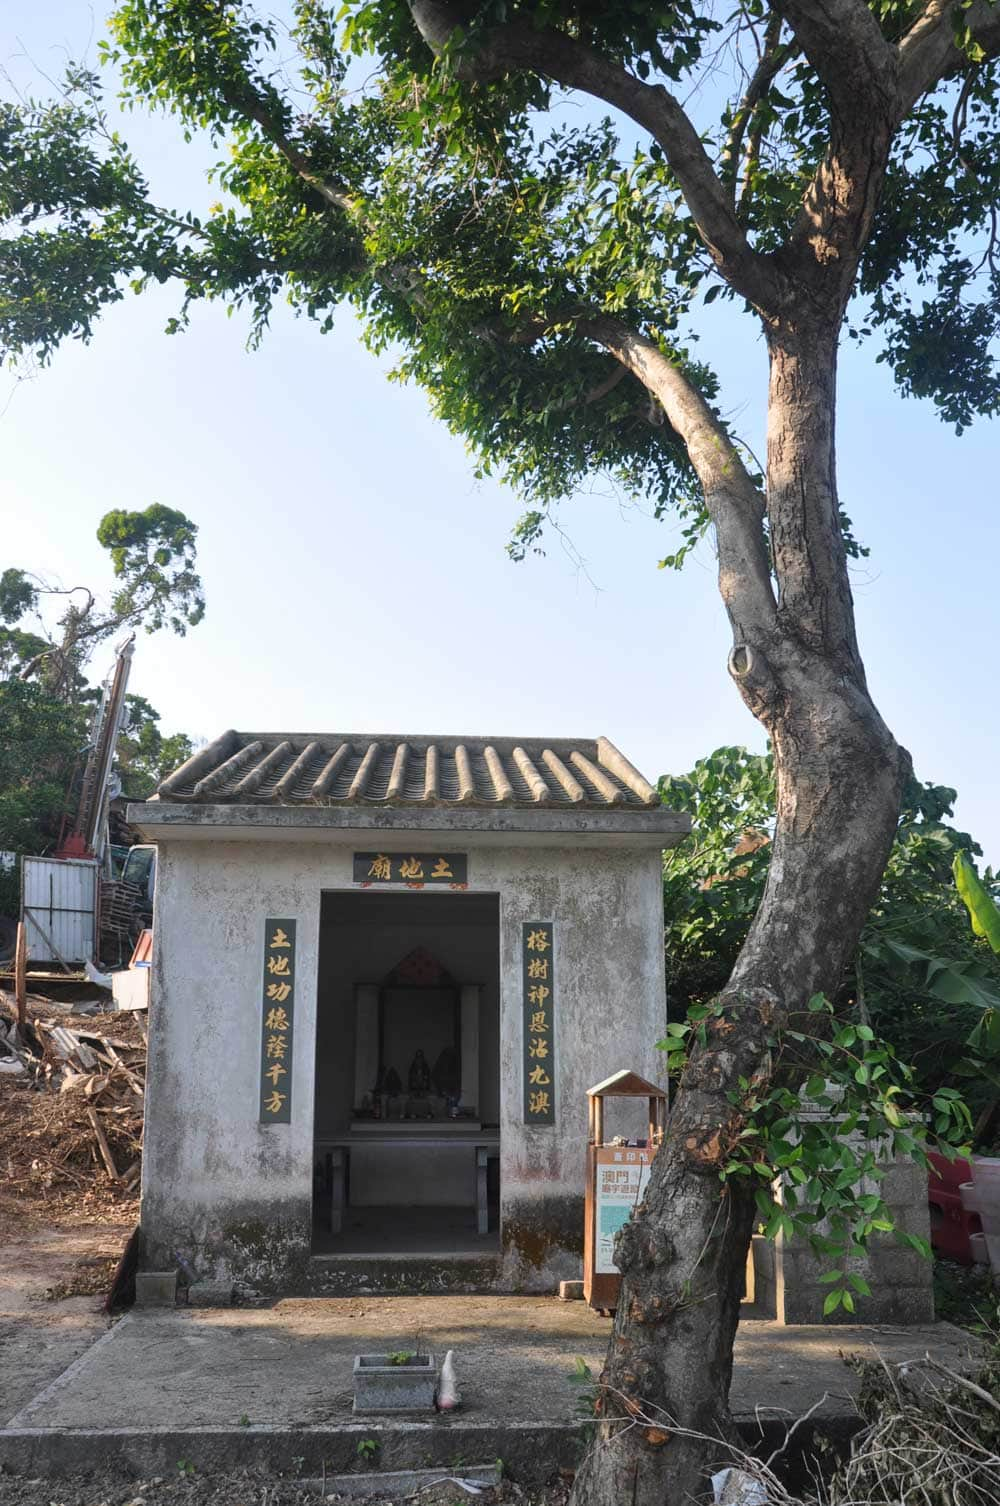 Coloane Temples: Toi Tei temple